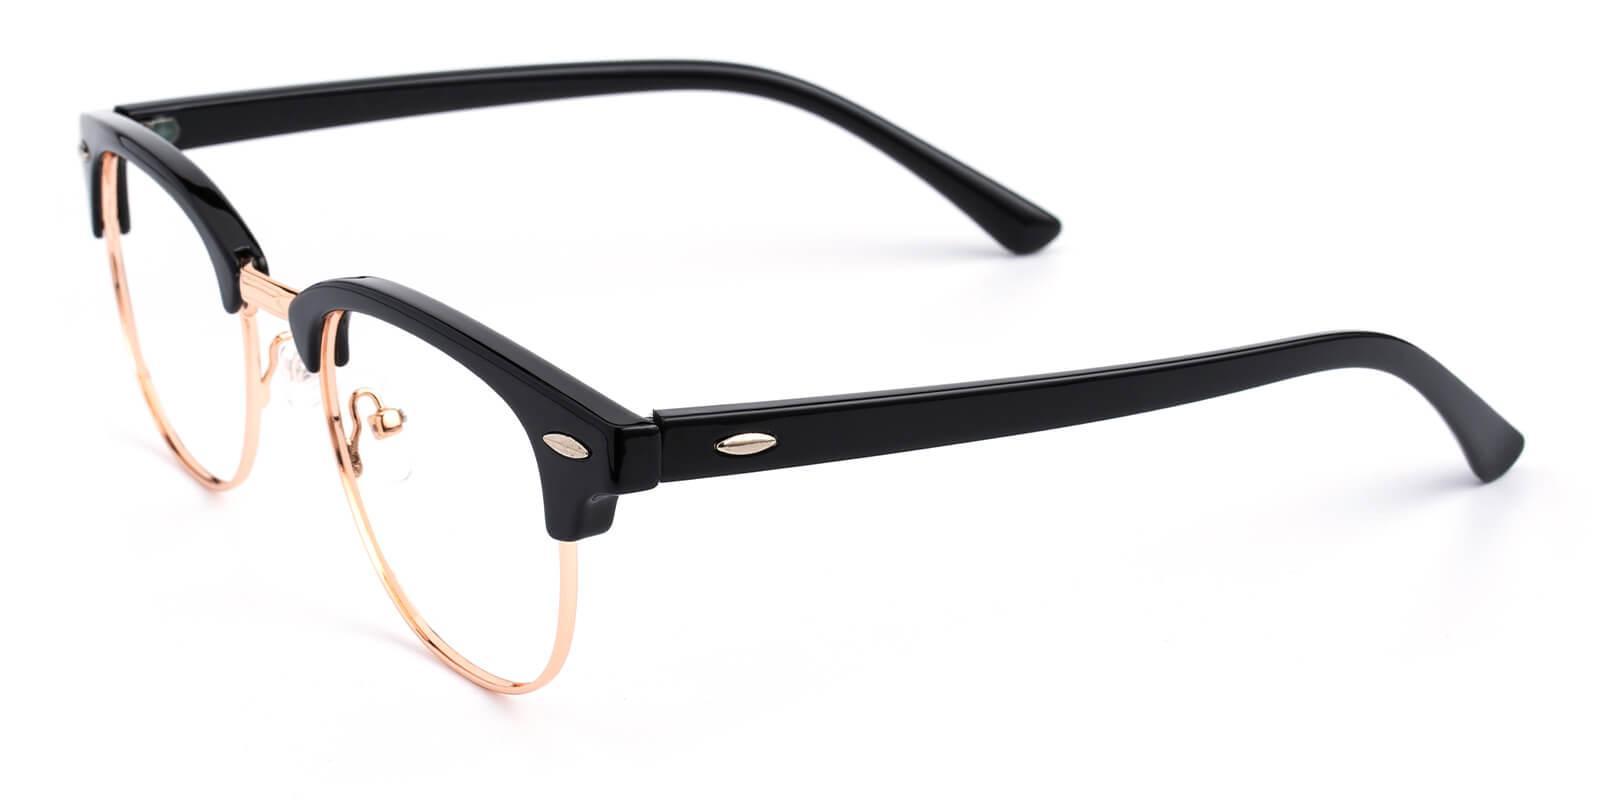 Creative-Black-Browline-Metal / Combination / Plastic-Eyeglasses-additional1